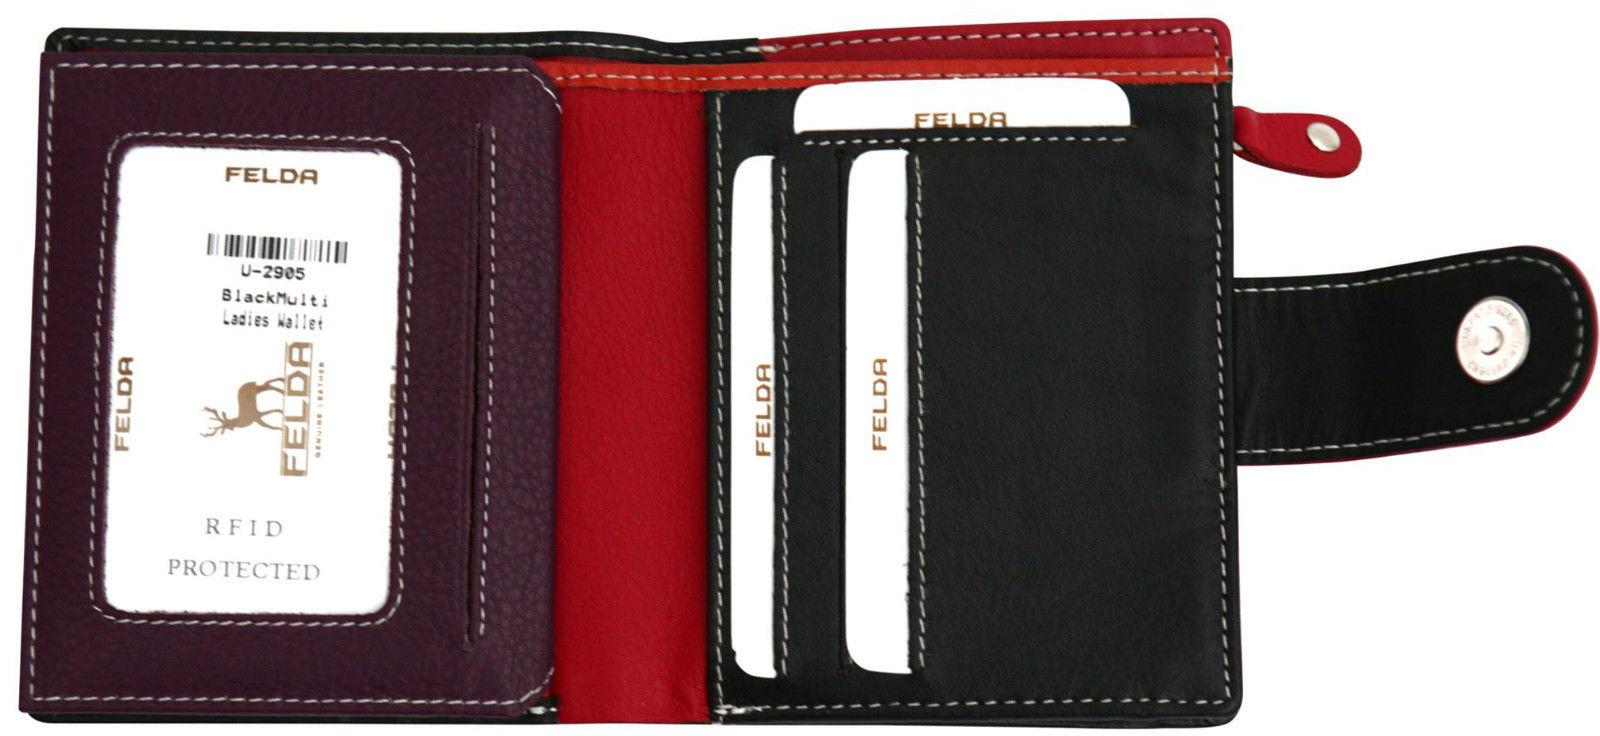 Felda-RFID-onorevoli-MEDAGLIA-amp-Card-Purse-Wallet-Genuine-Leather-Multi-SOFT-BOX-REGALO miniatura 19